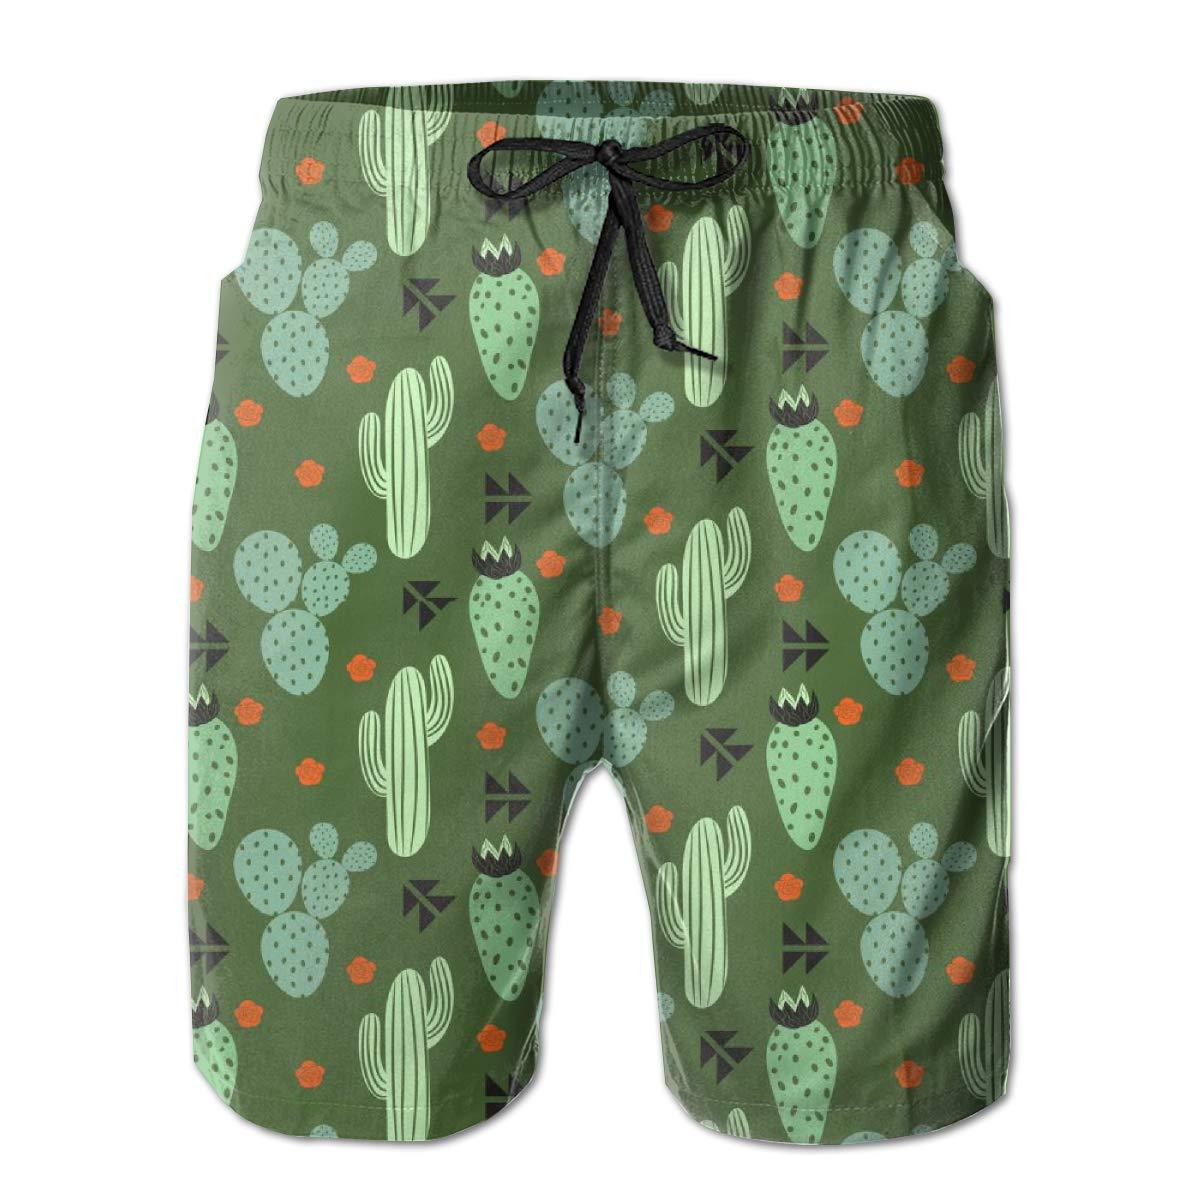 Yeates Flower Mens Swim Trunks Quick Dry Large Planted Cactus Green Printed Summer Beach Shorts Board Beach Short